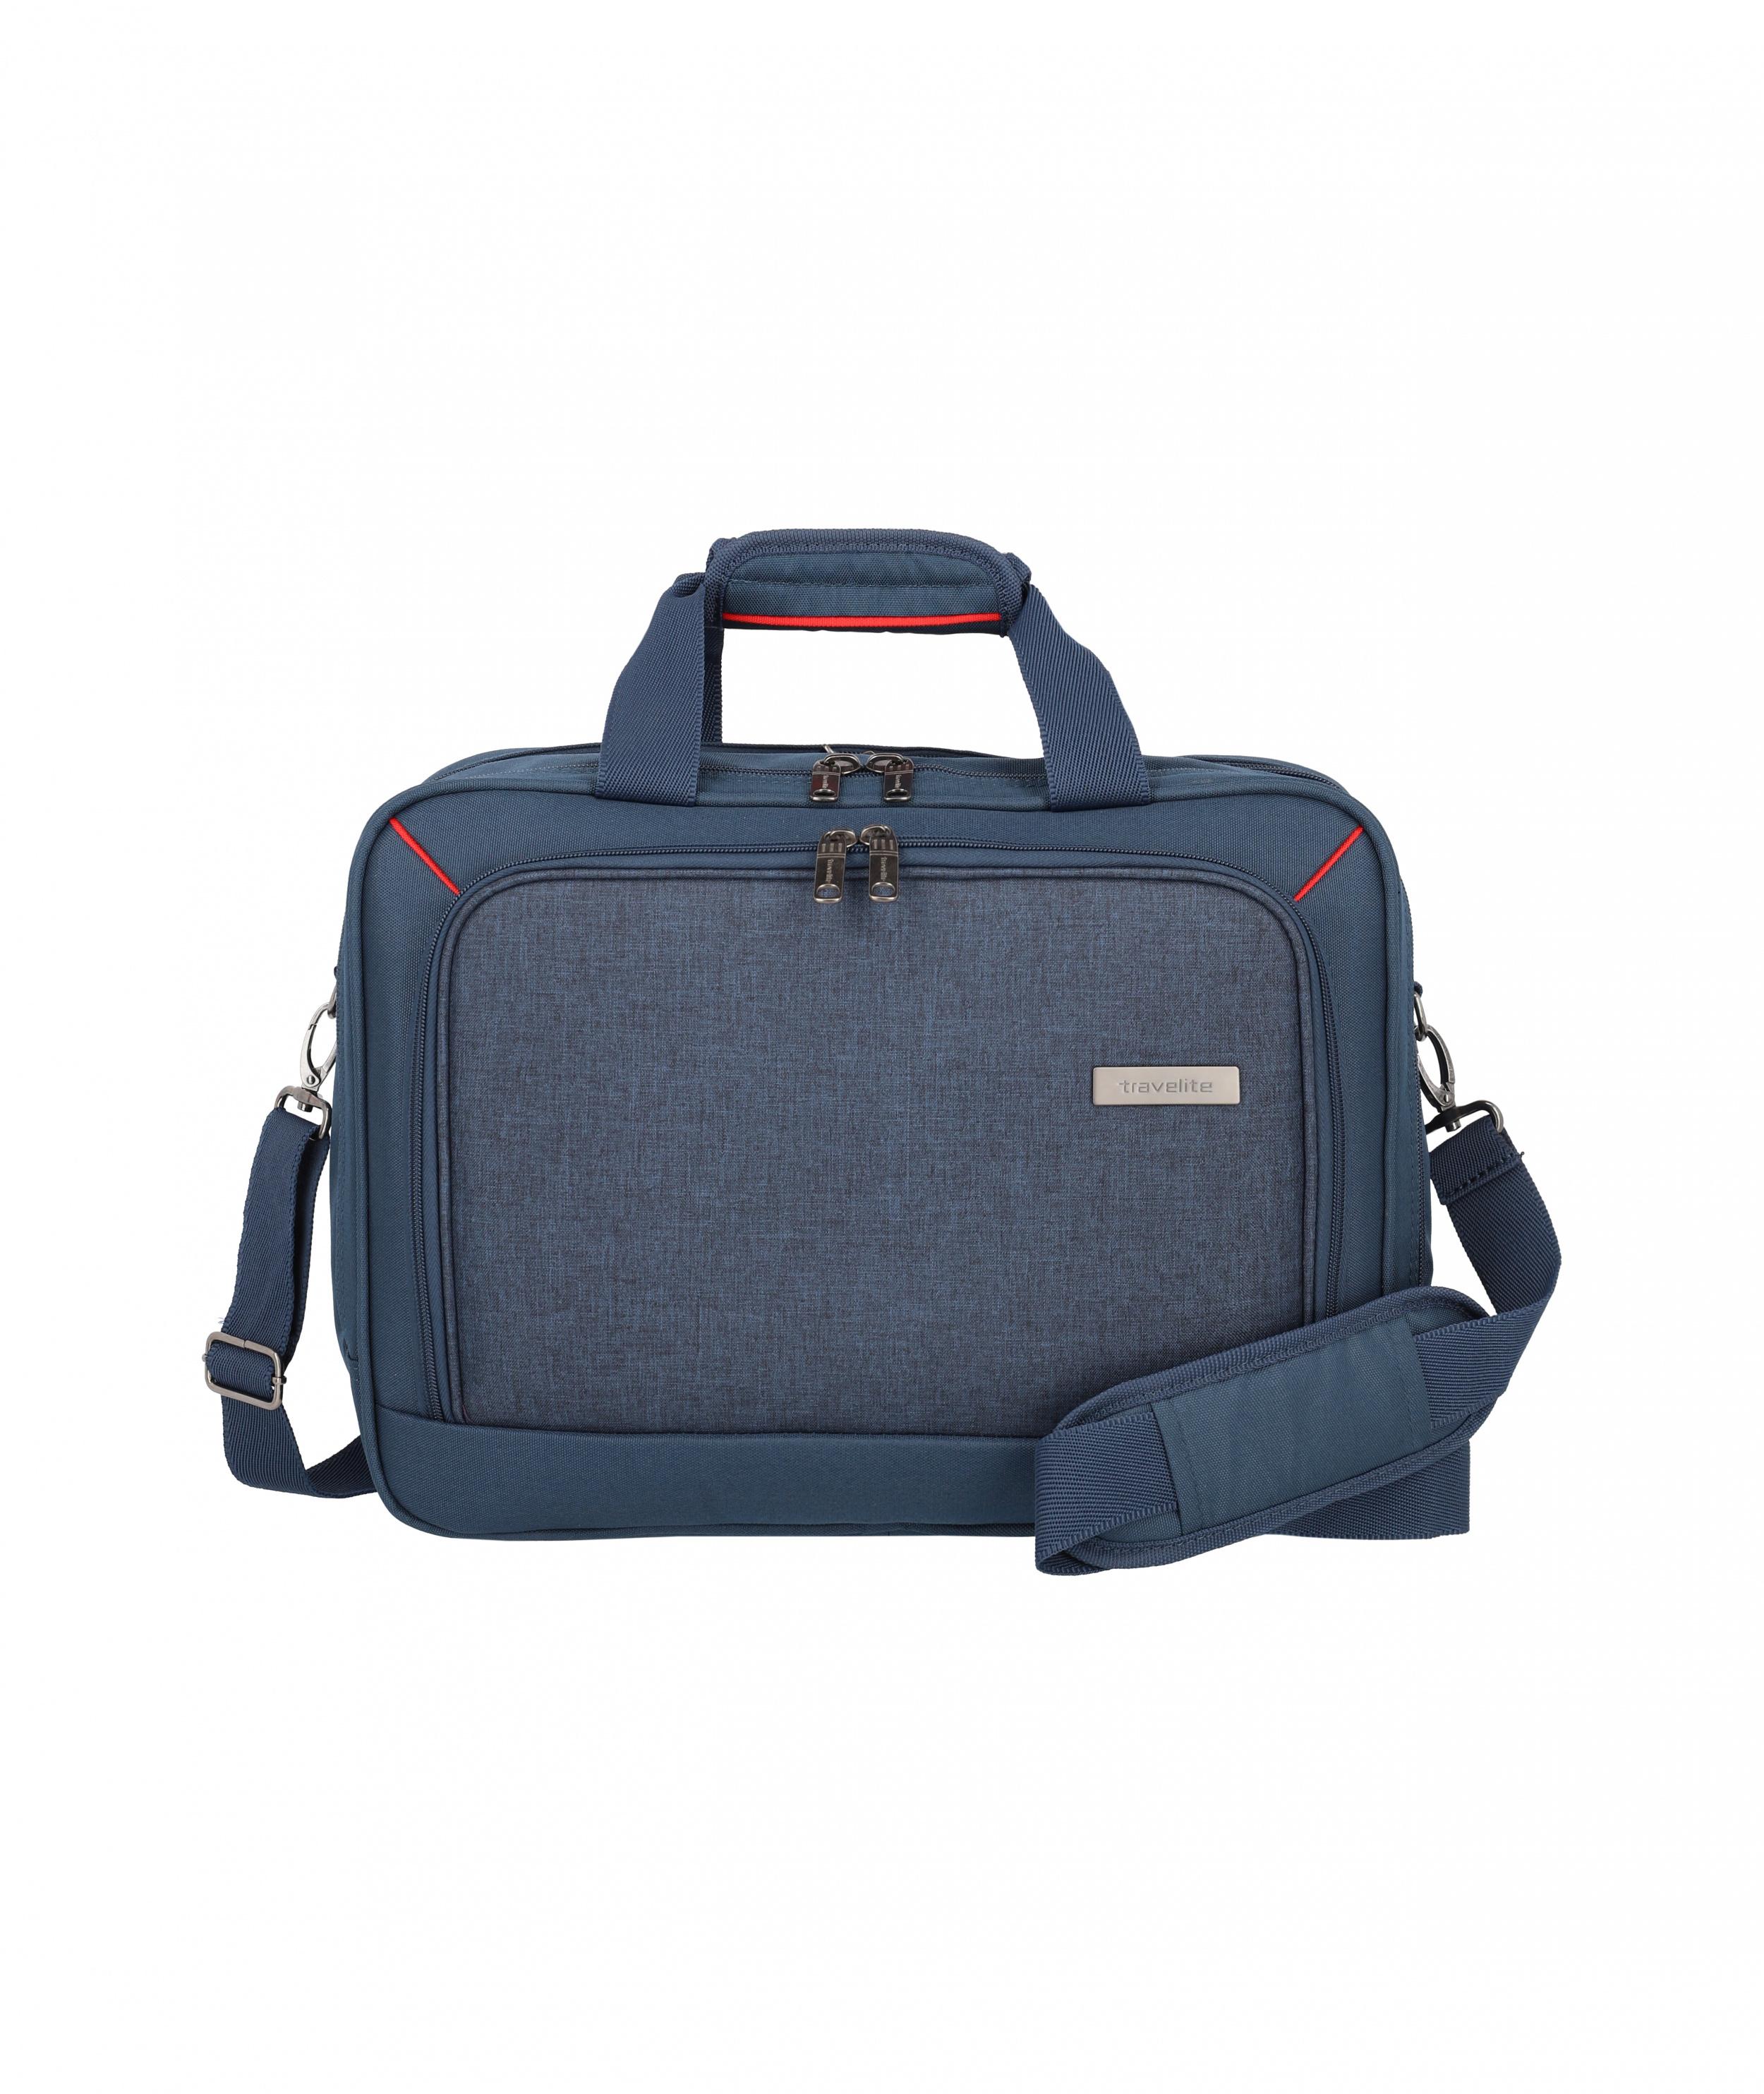 Travelite Arona Boardbag 090244 Navy